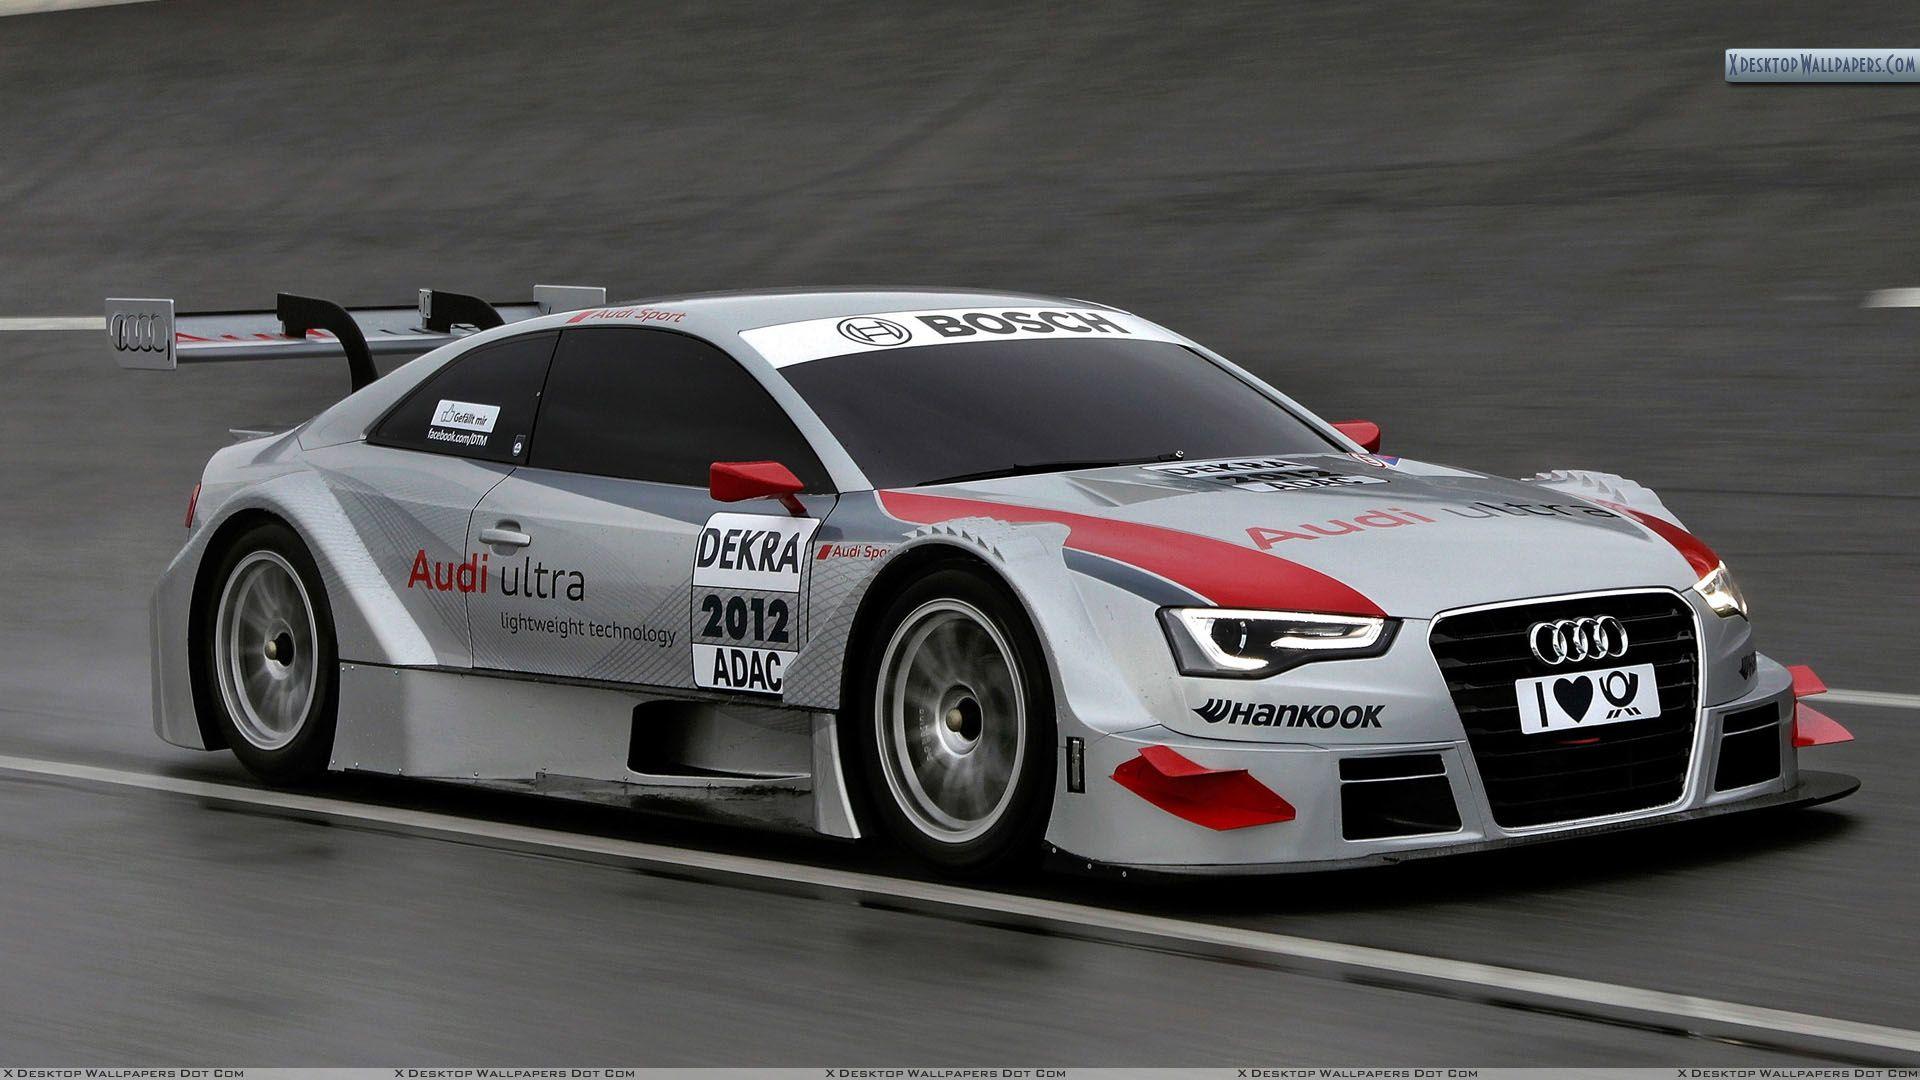 2012-Audi-A5-DTM-   RACING CARS   Pinterest   Audi a5 and Cars